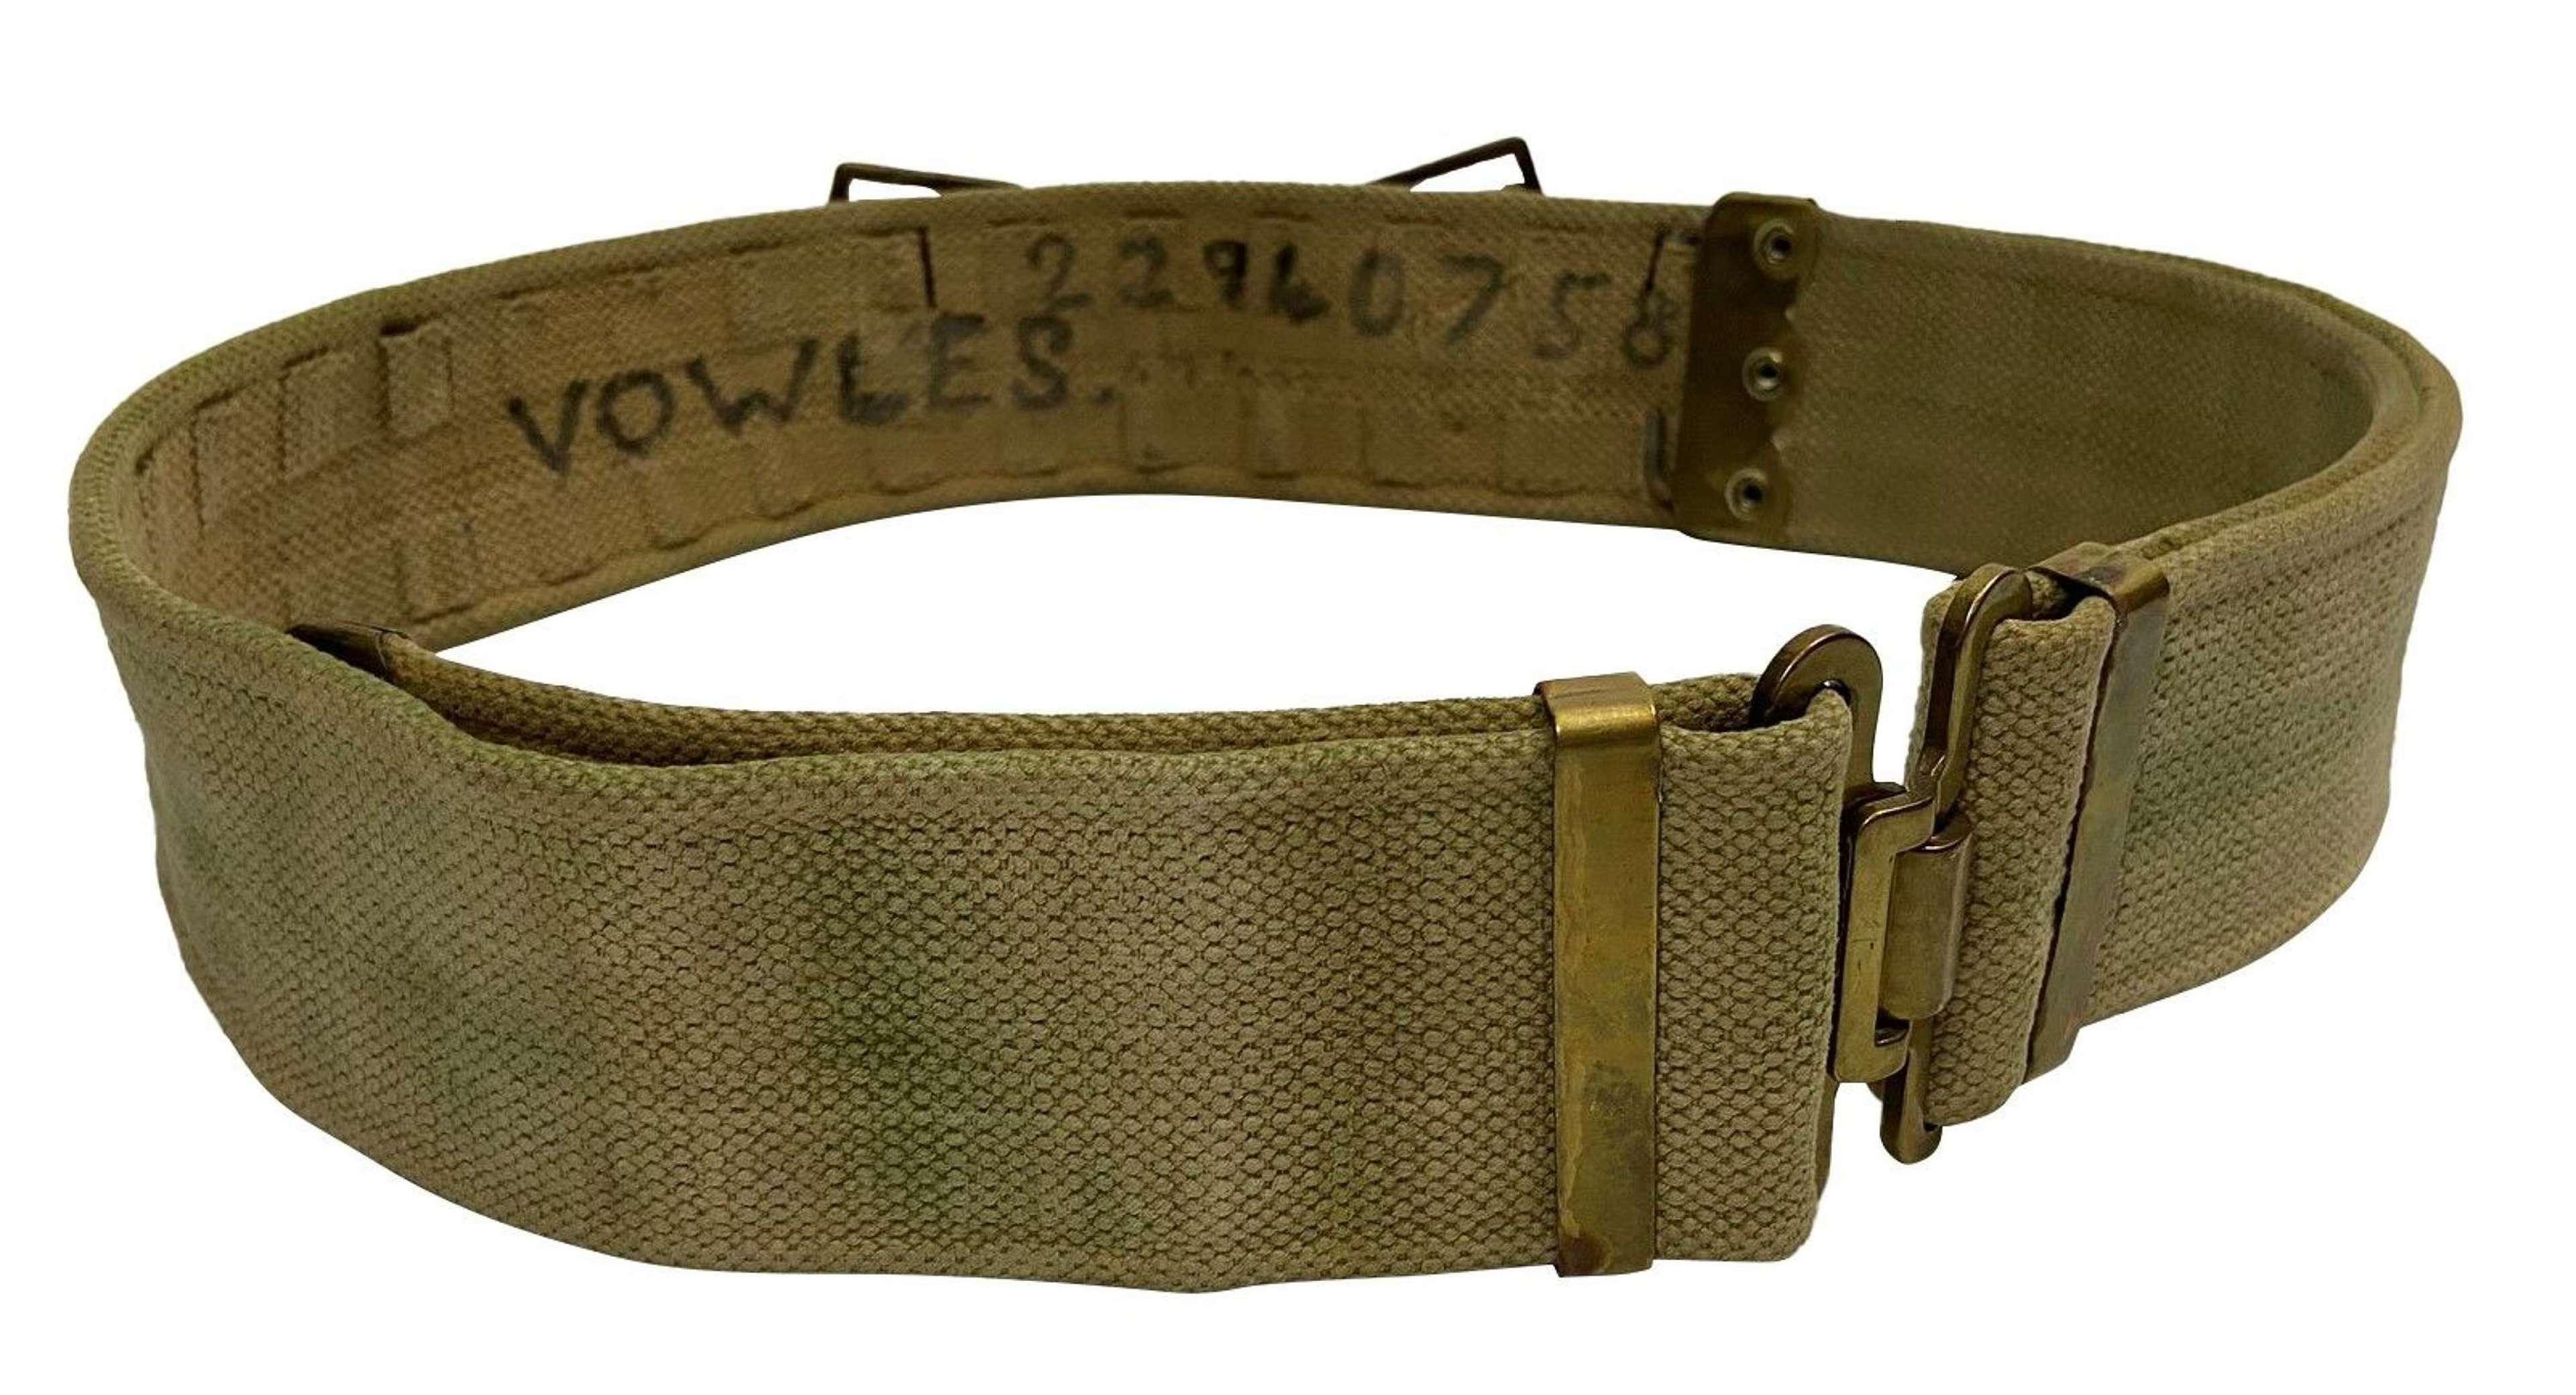 Original 1937 Pattern Webbing Belt - Large size